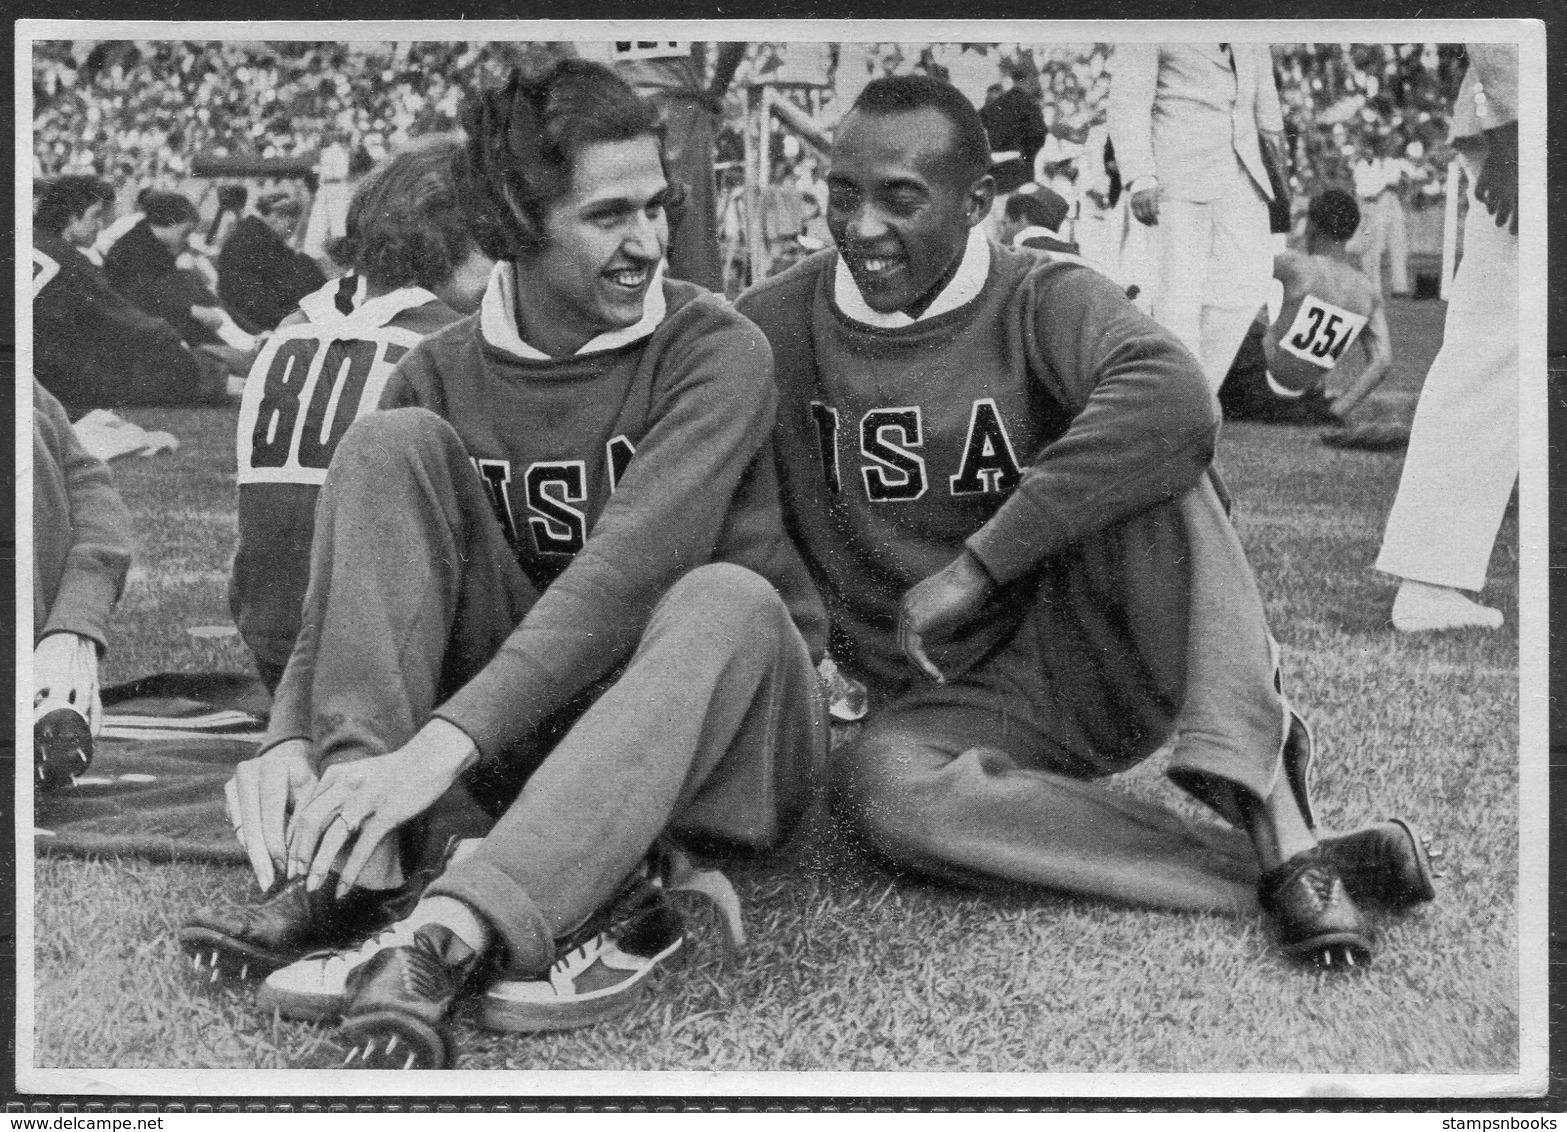 1936 Germany Berlin Olympics Olympia Sammelwerk 14 Bild 21 Gruppe 58 USA Jesse Owens, Helen Stephens - Trading Cards